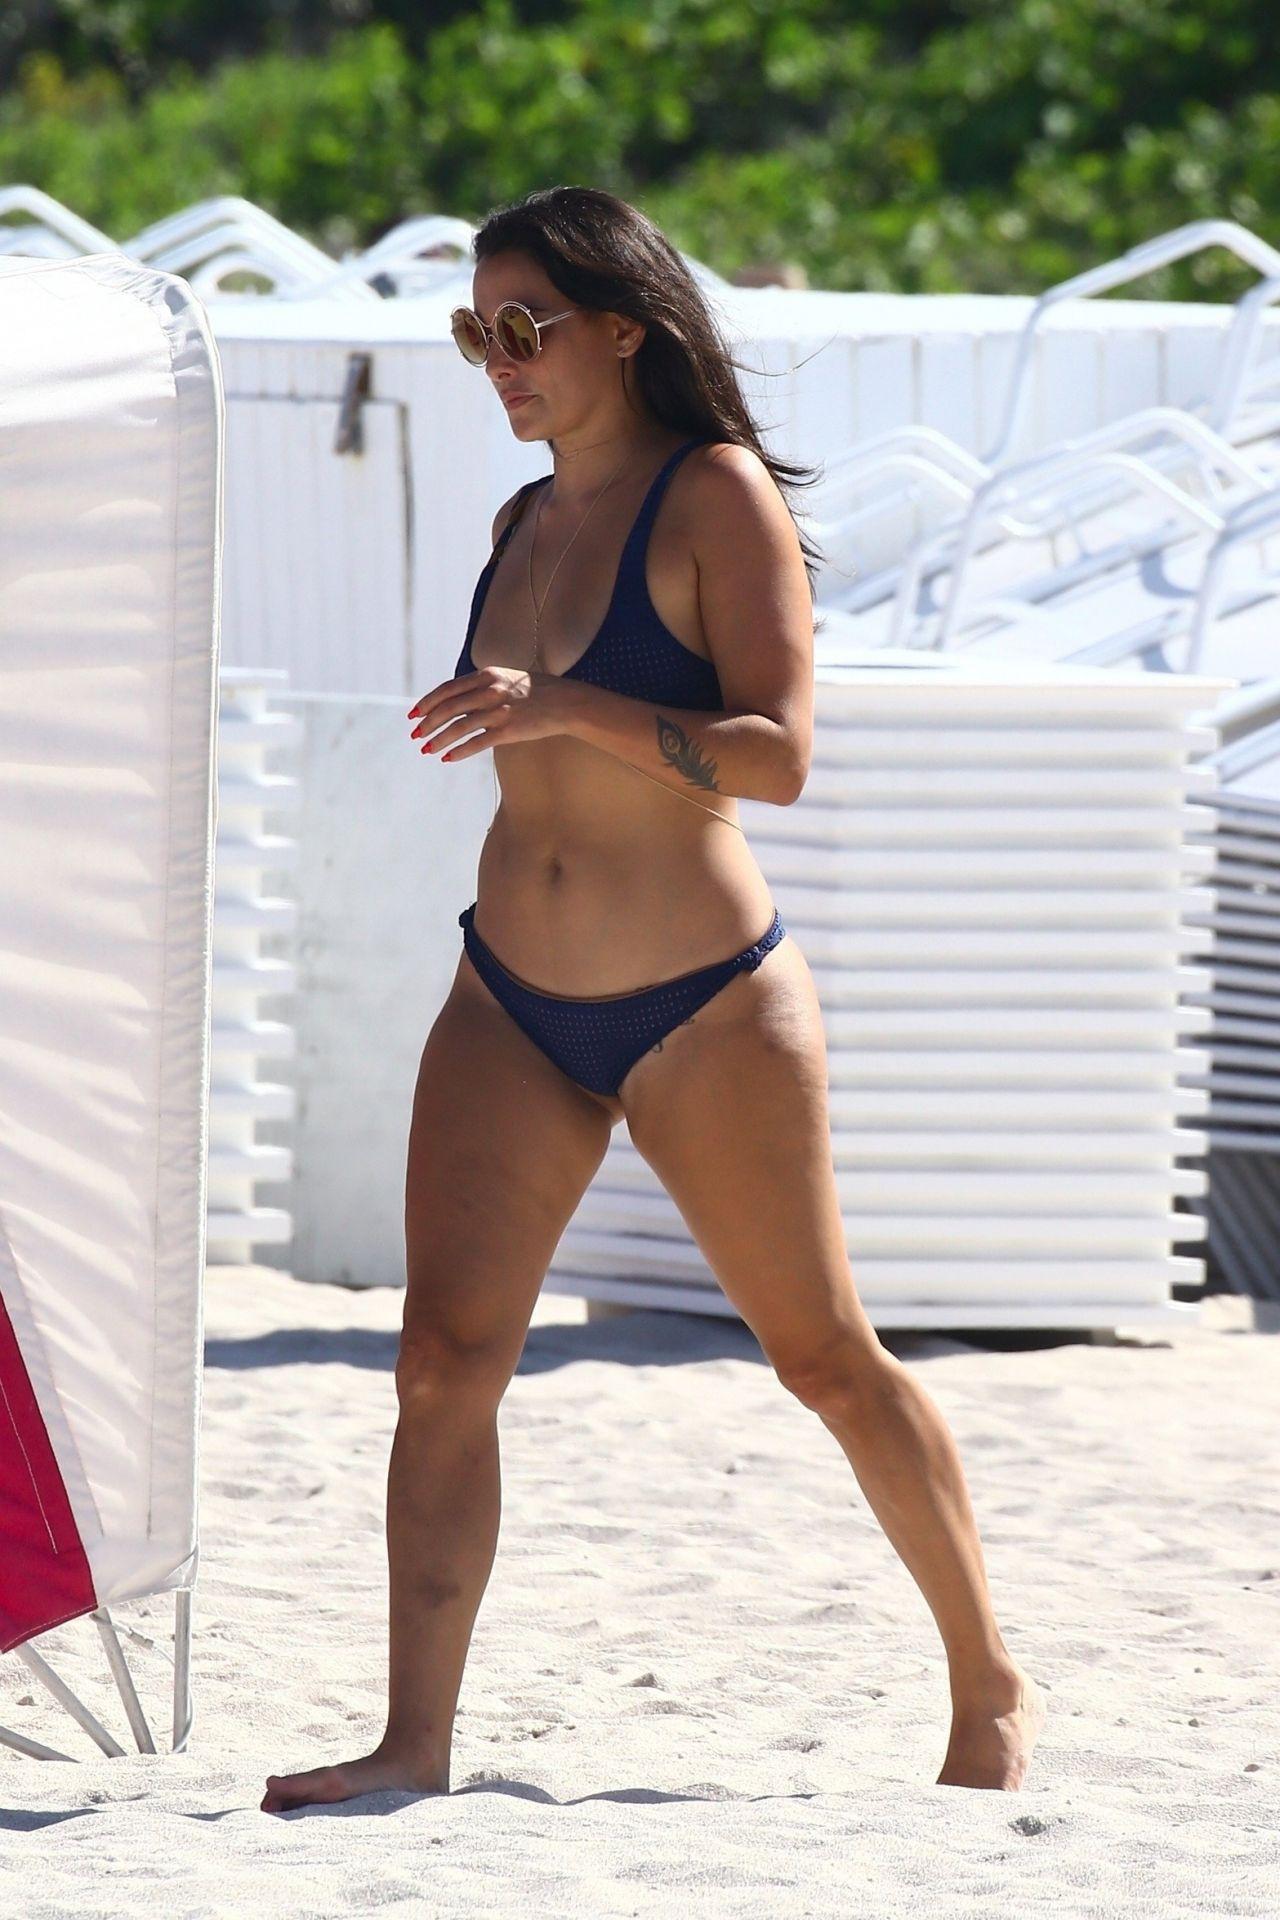 Natalie Martinez In A Bikini - Miami Beach 07142017-1931